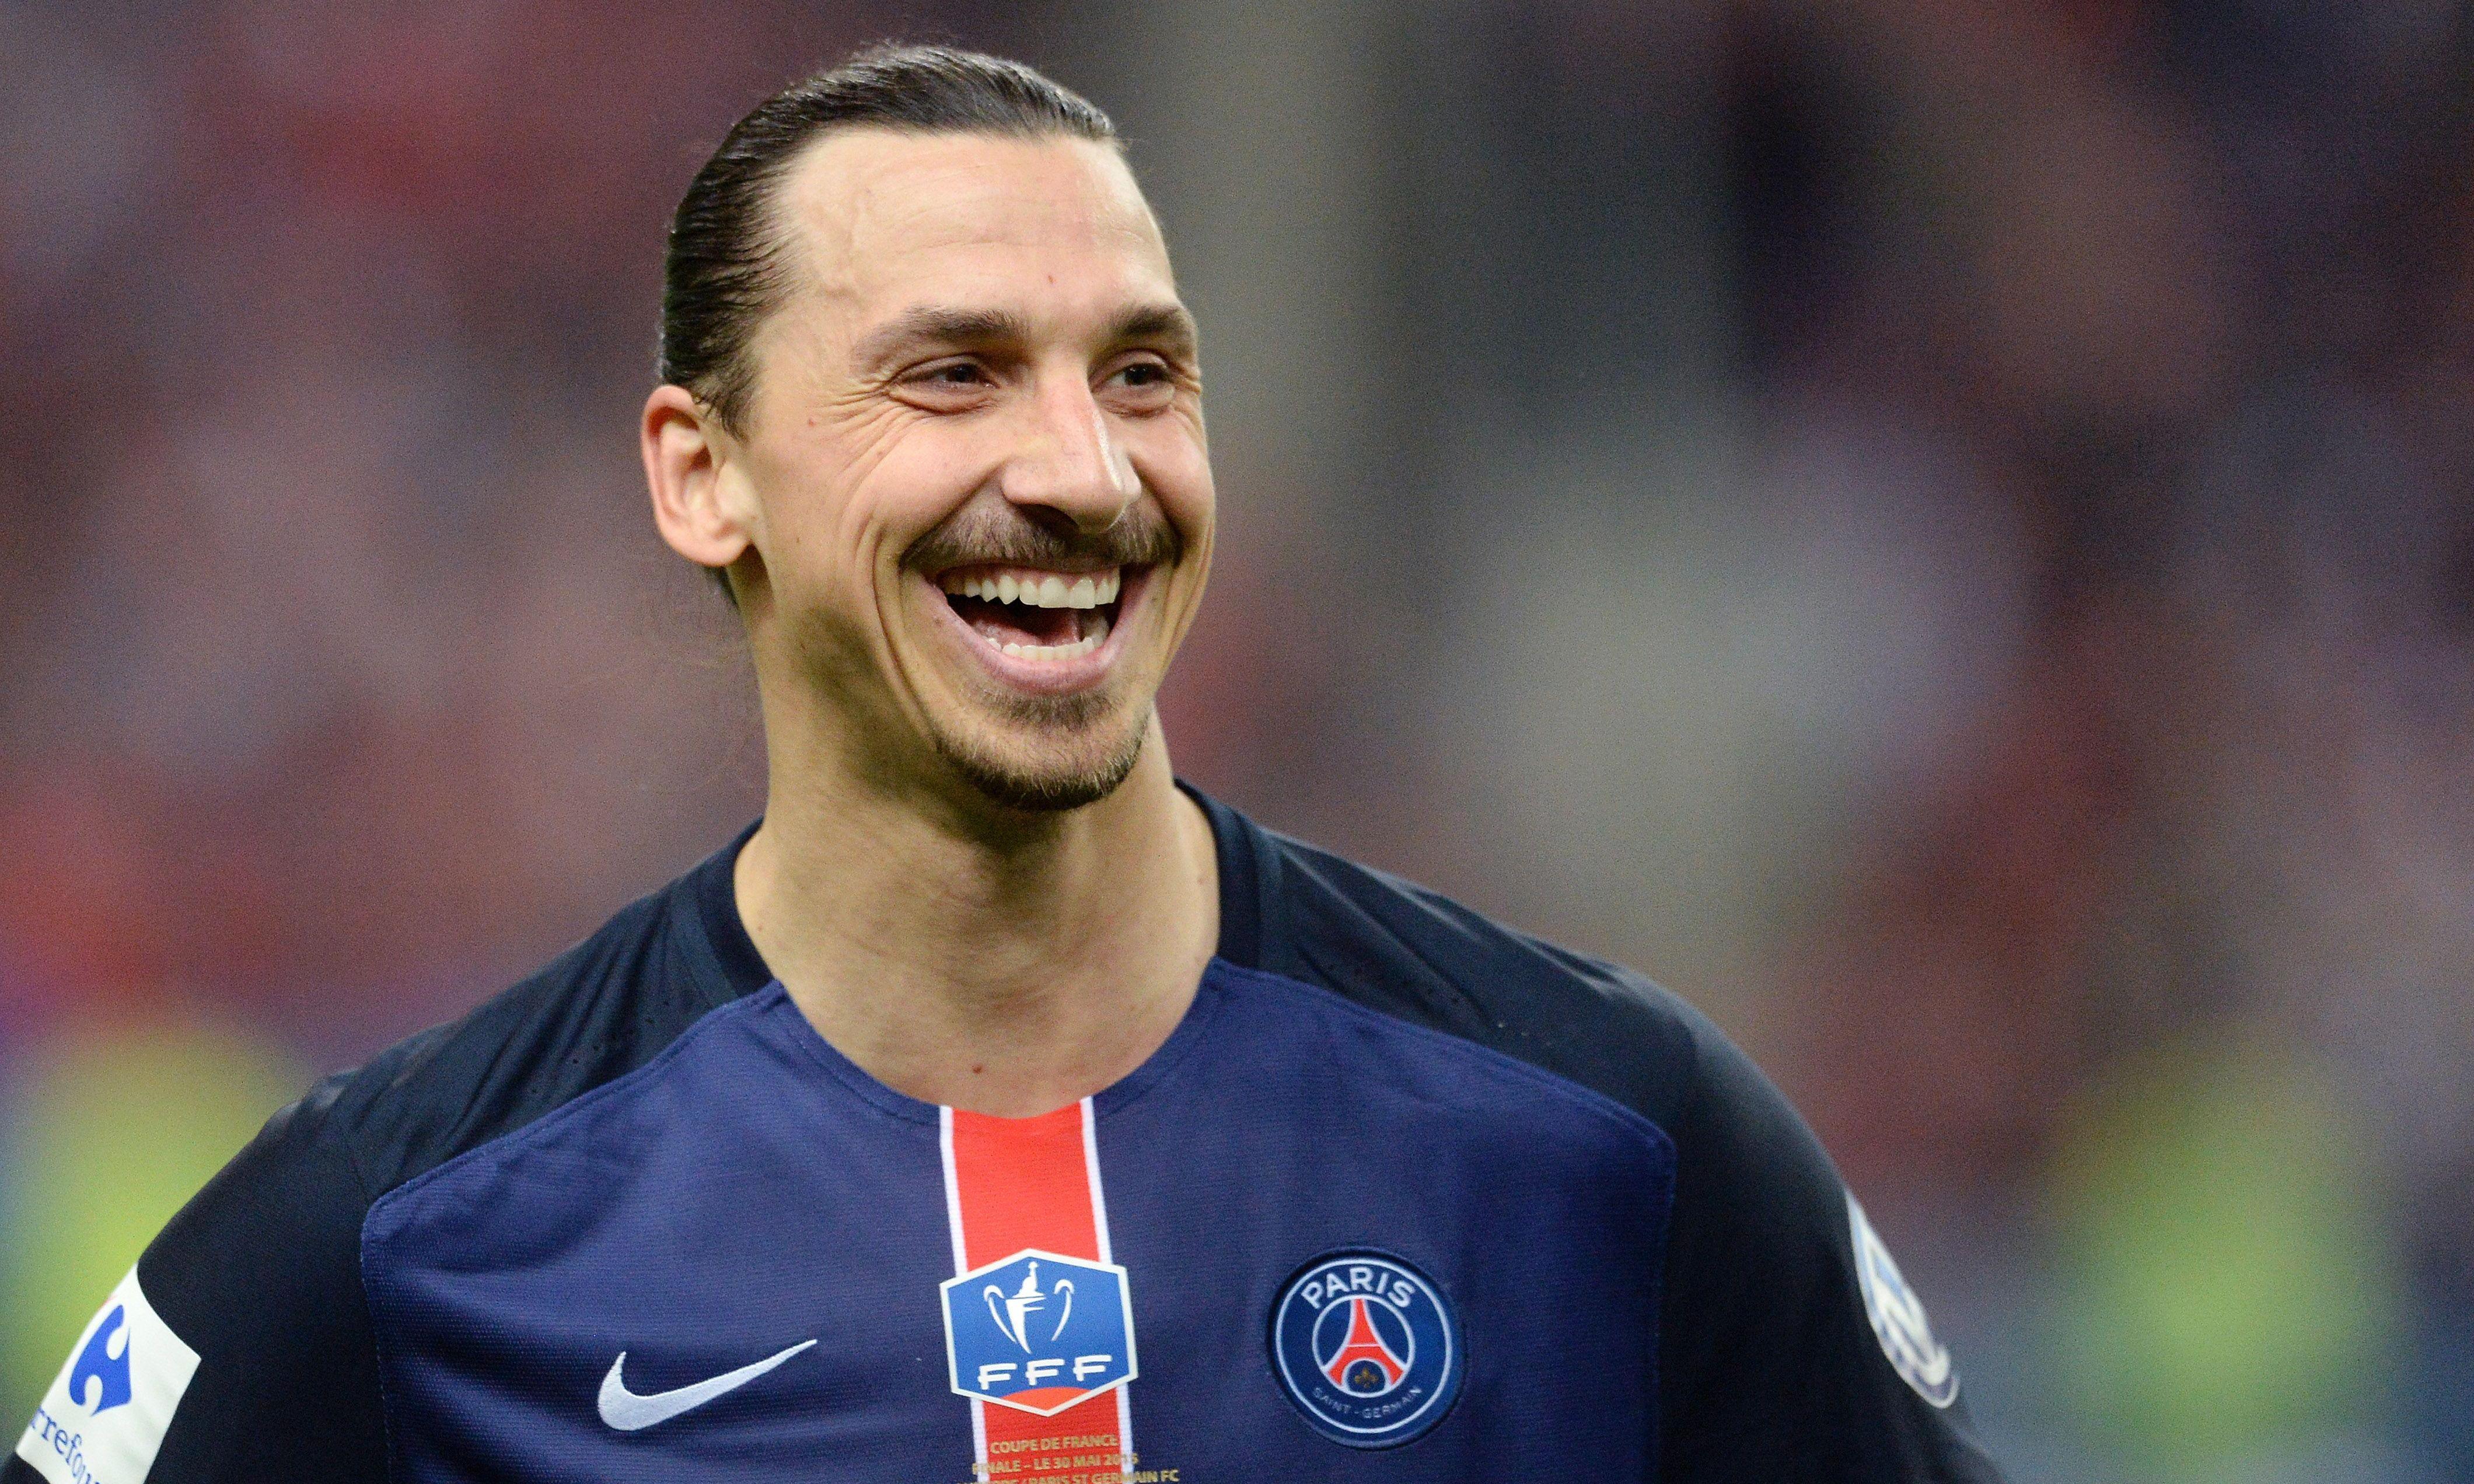 Zlatan-Time! Zlatan Ibrahimovic's Greatest Quotes